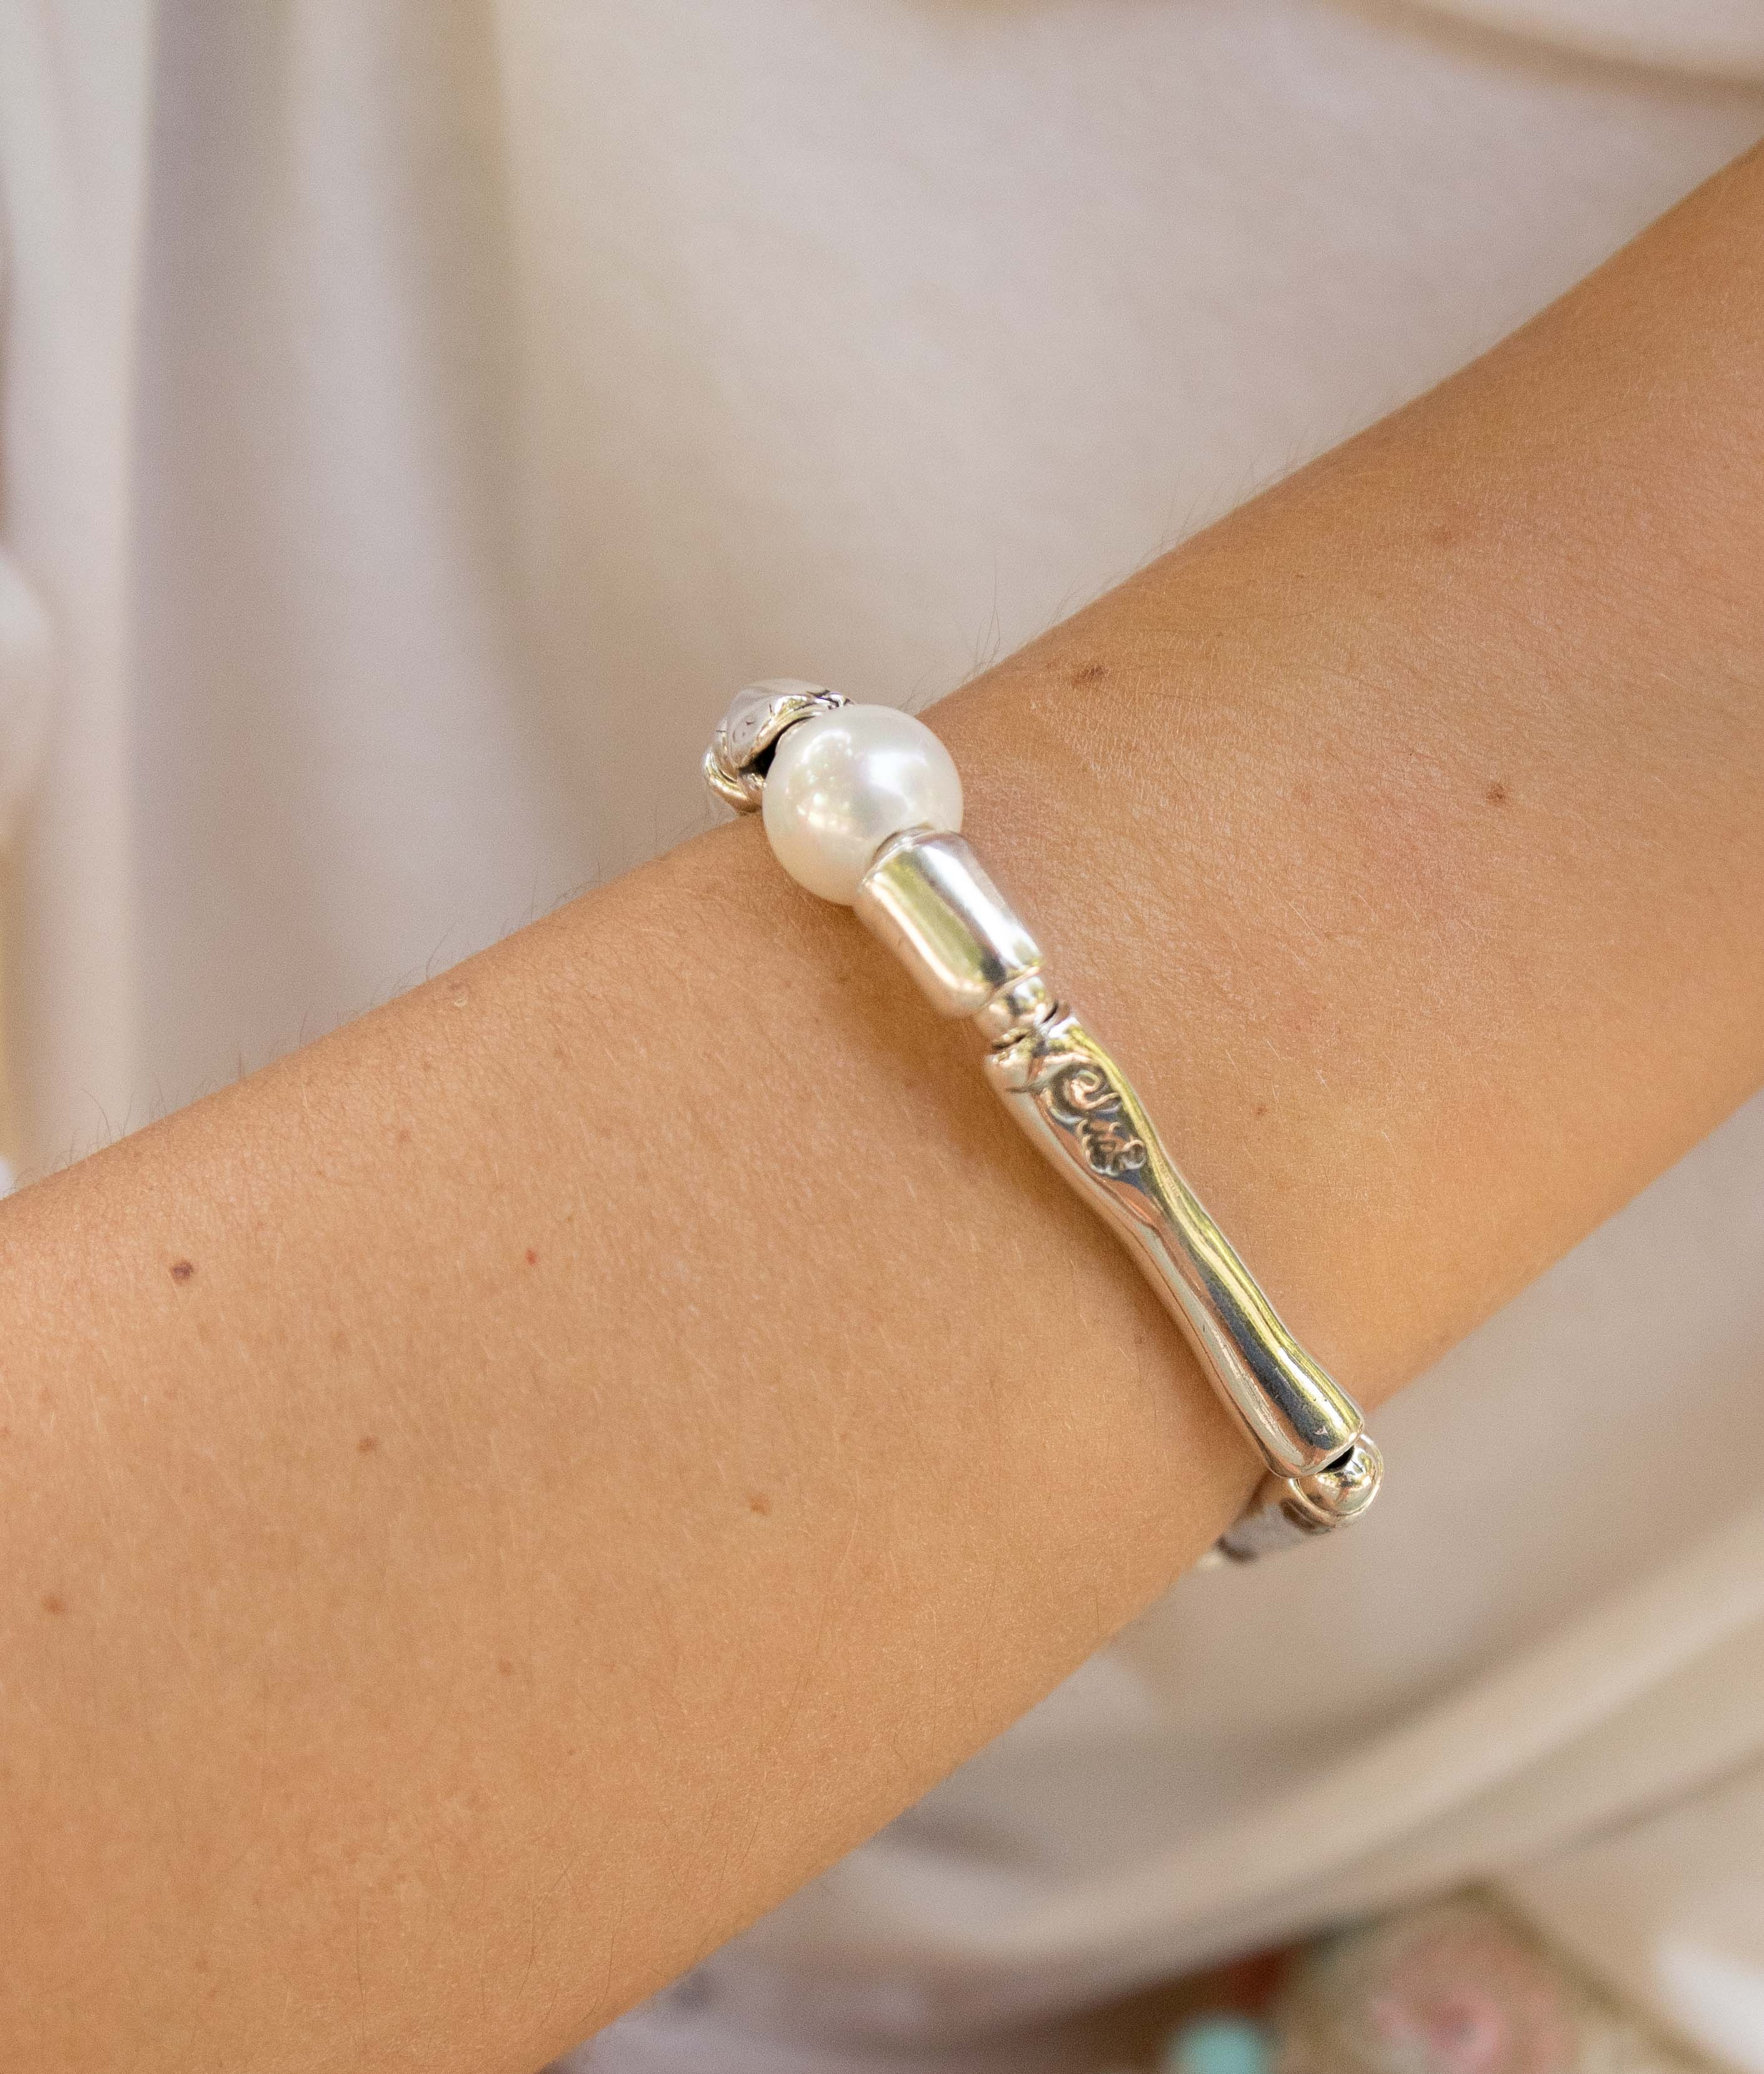 Braccialetto Bambú Perla - Argento